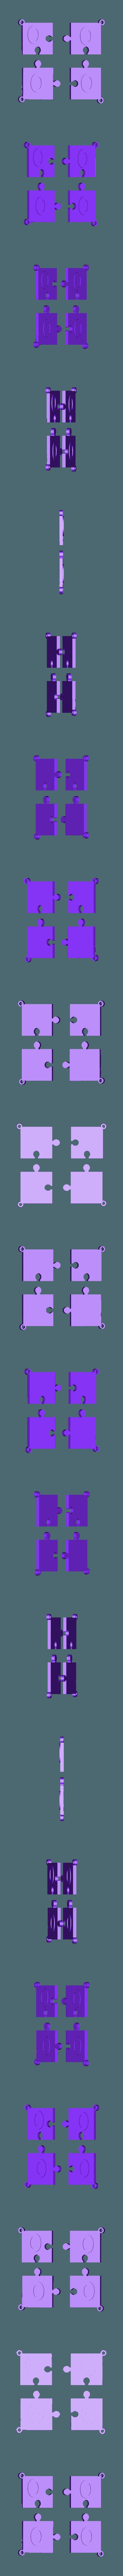 puzzle 0.stl Download STL file puzzle key ring • 3D printing design, catf3d